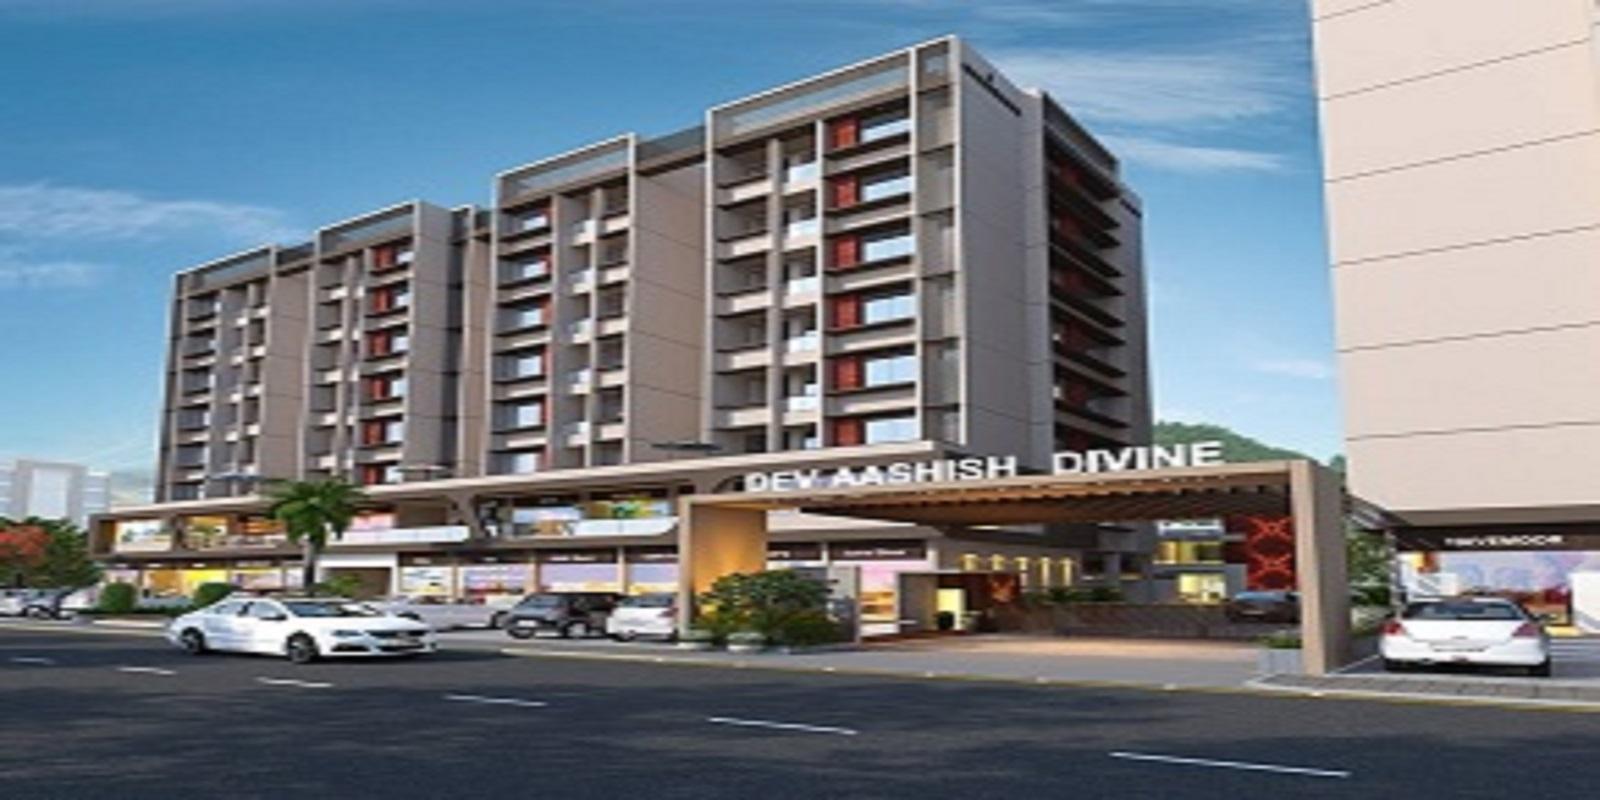 abjibapa dev aashish divine project project large image1